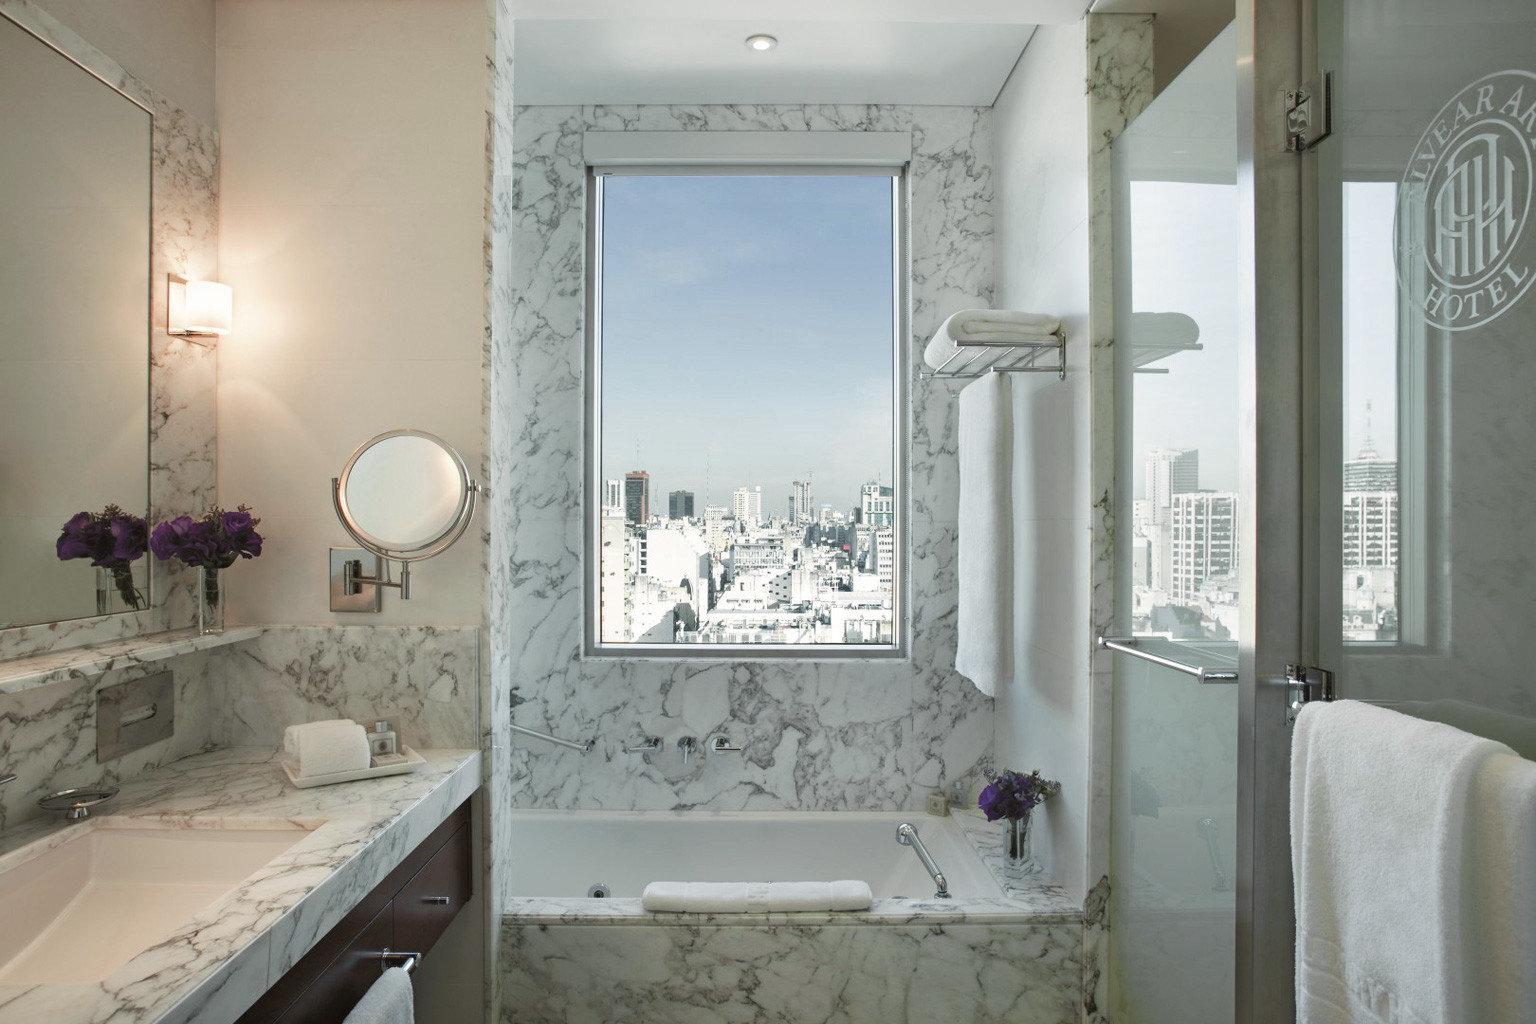 Bath City Classic Scenic views bathroom property house sink home plumbing fixture tub